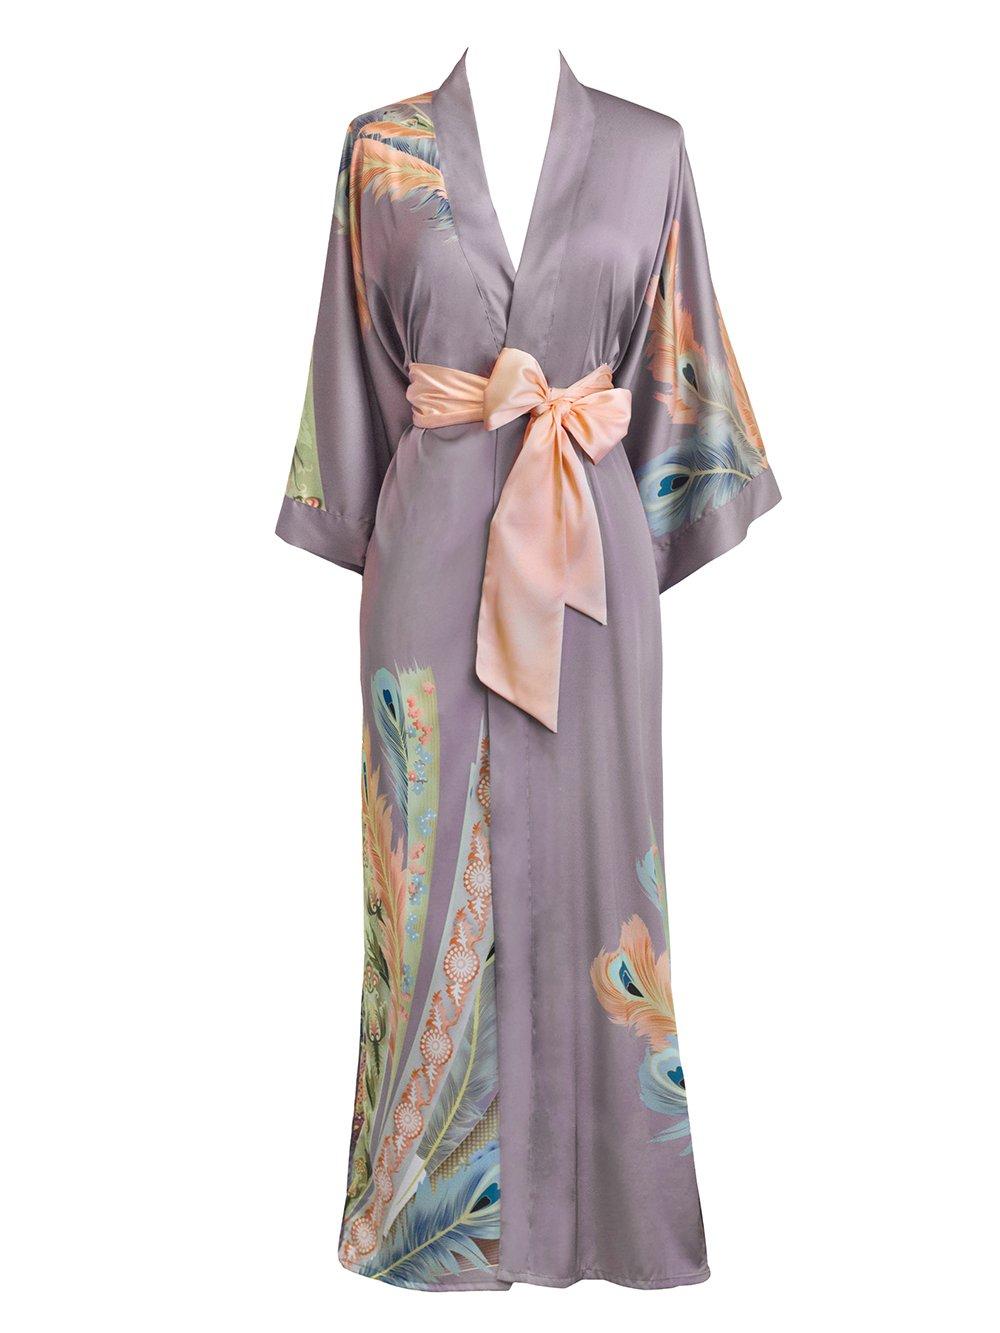 Old Shanghai Women's Kimono Robe Long - Watercolor Floral, Peacock Feather- Dusk